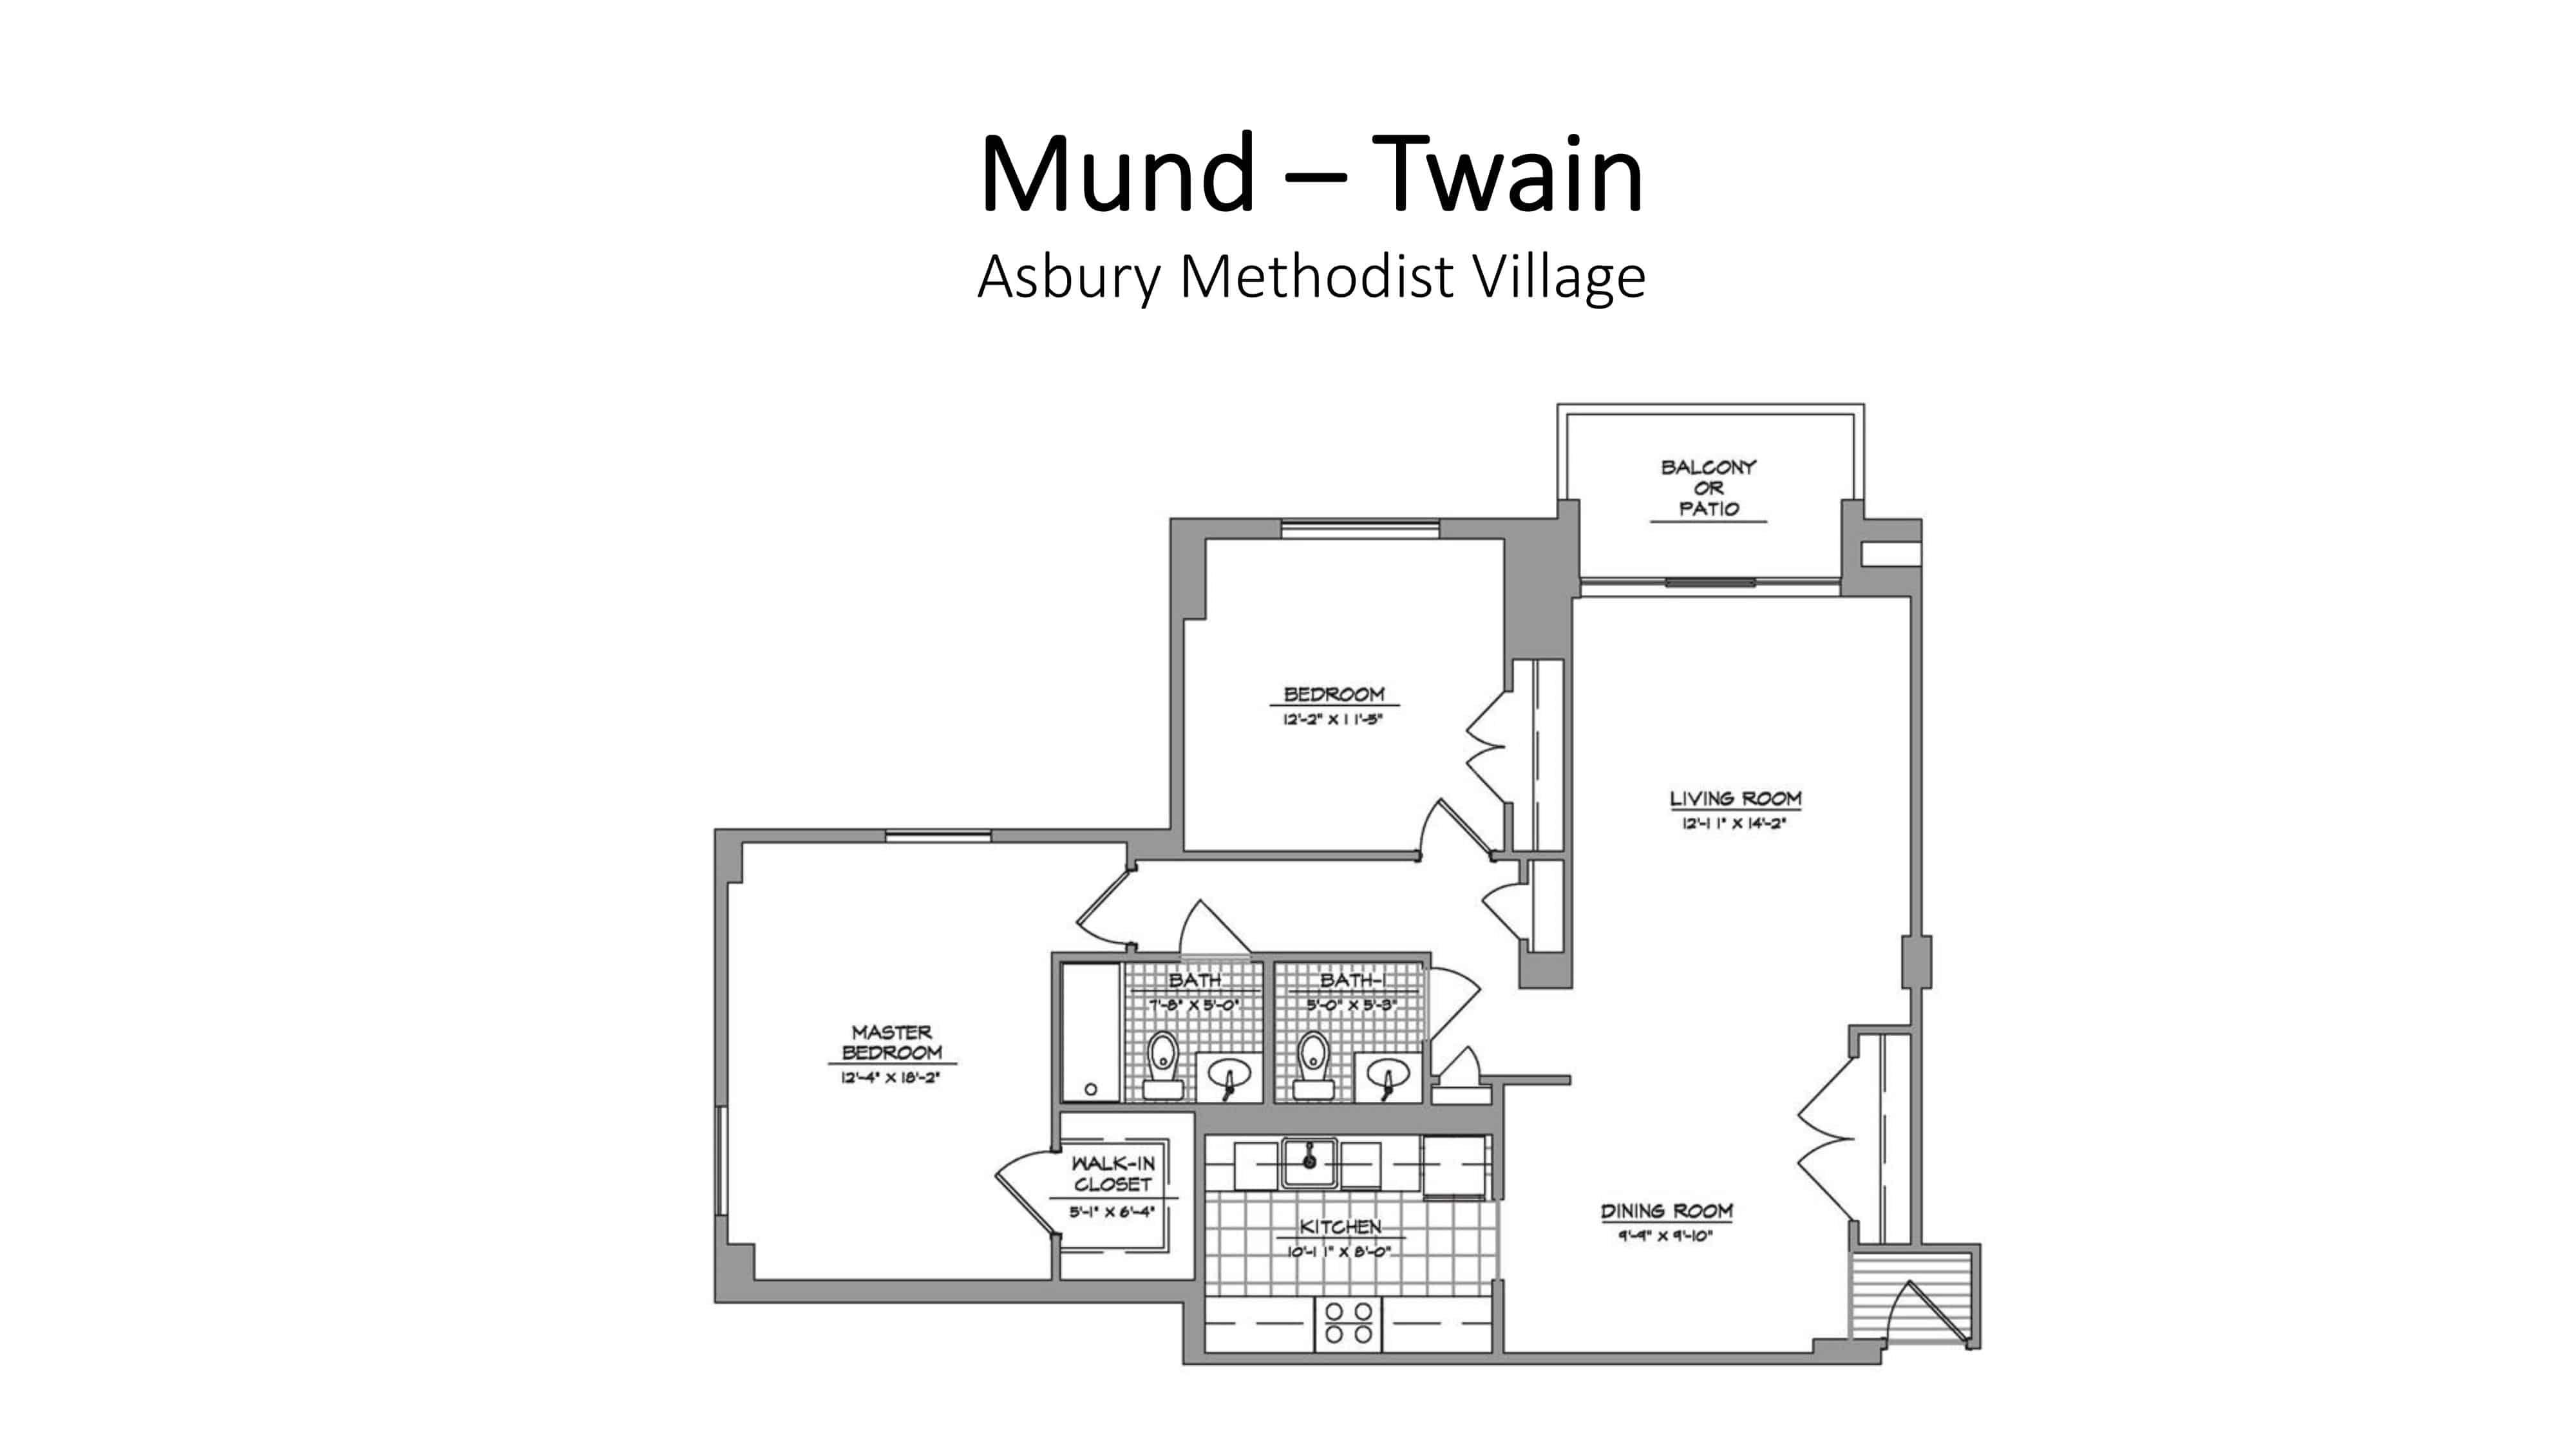 AMV Mund - Twain